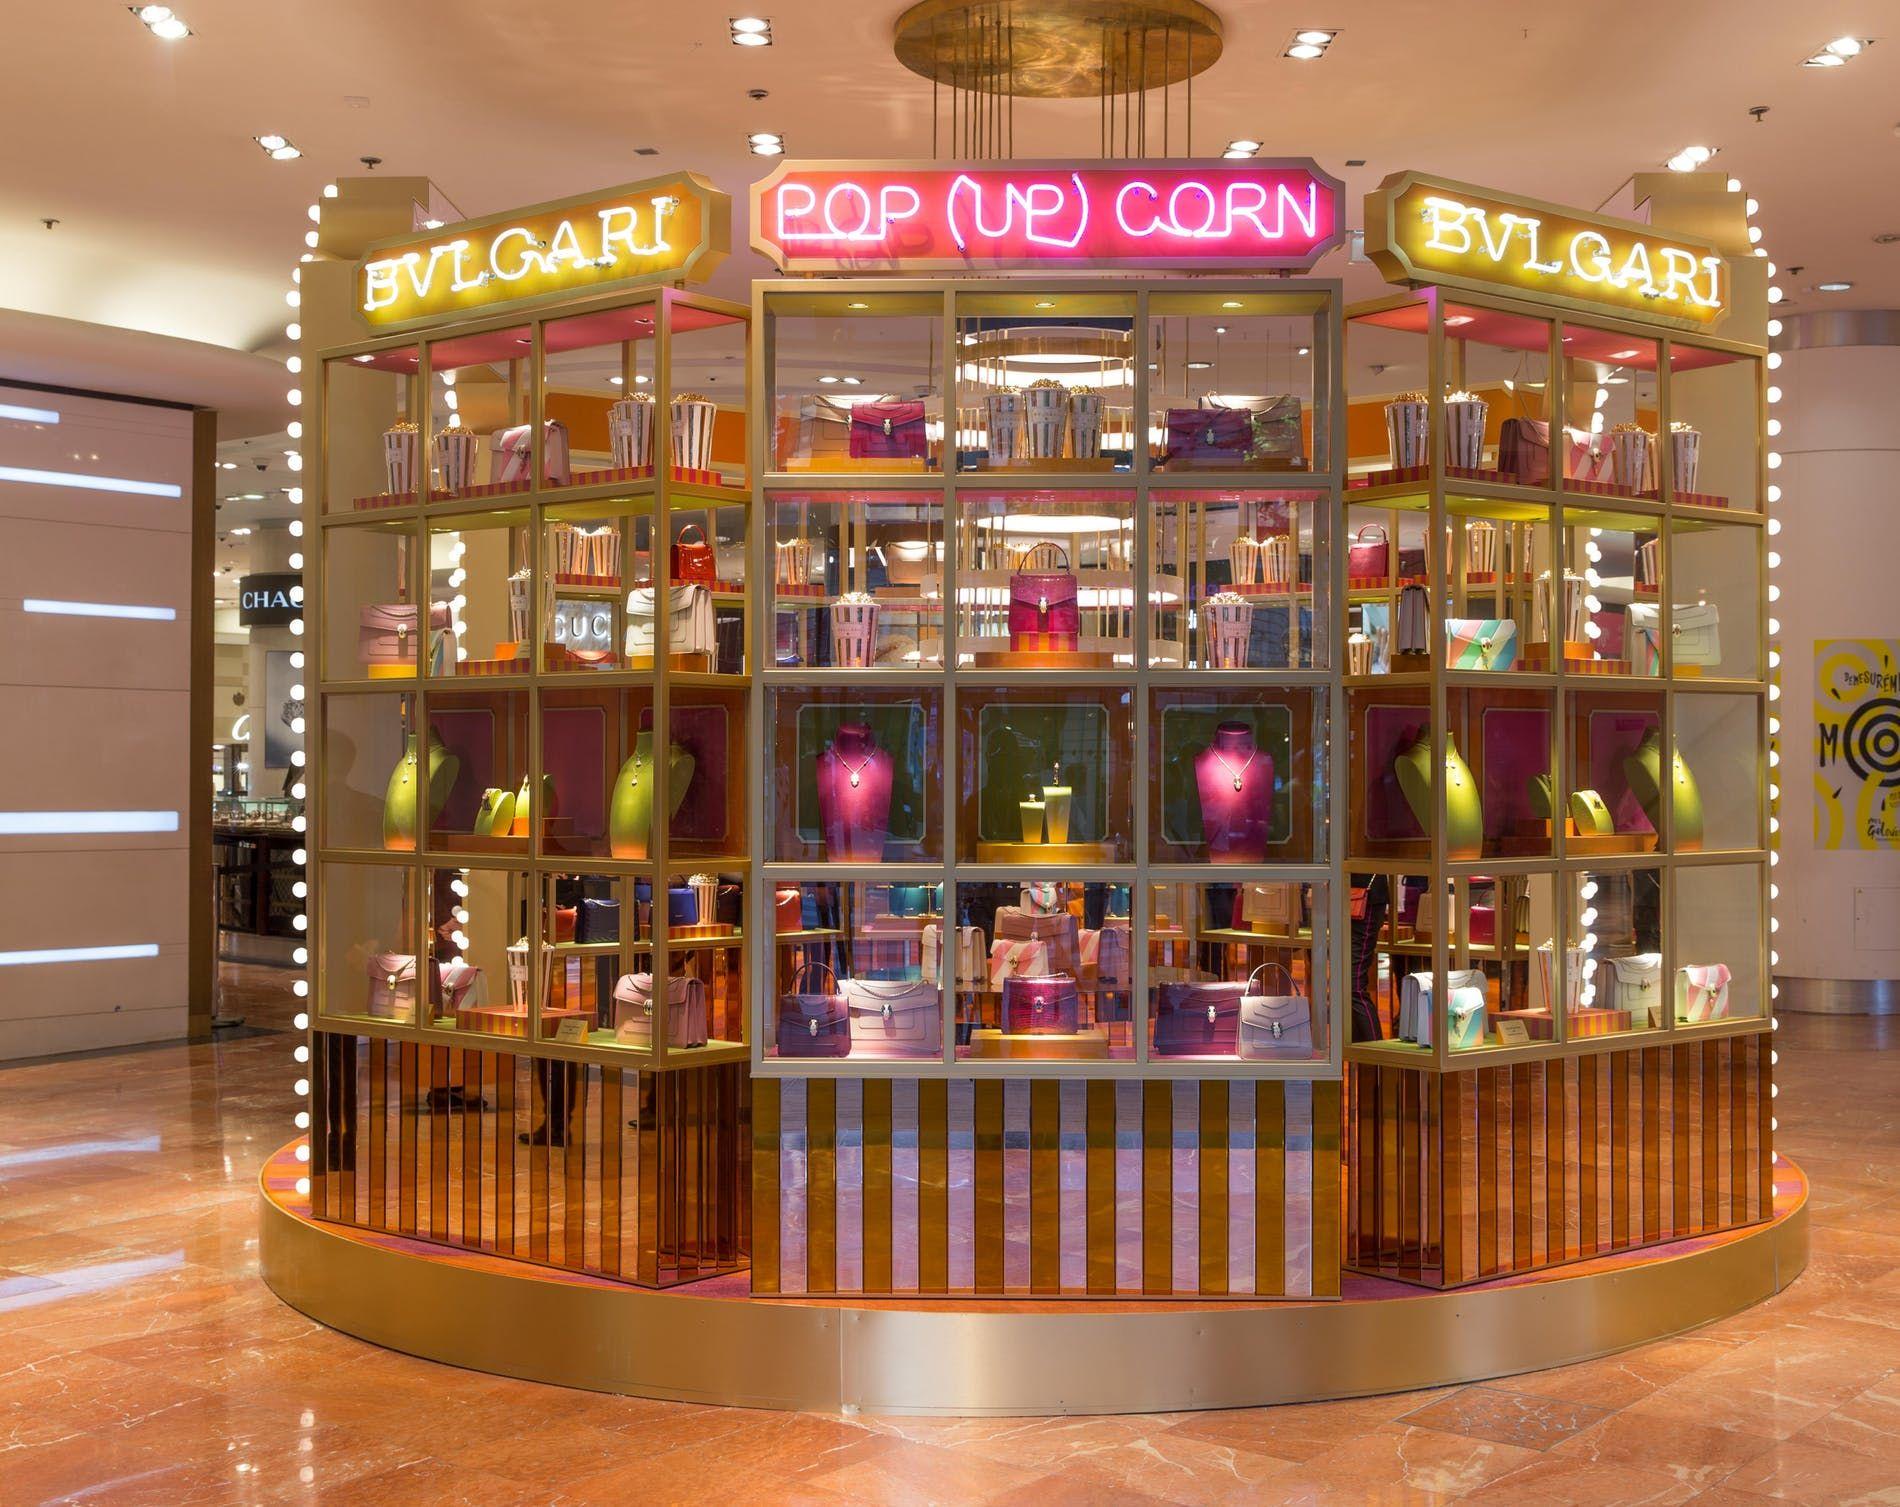 0b0c63b0abd7c Bulgari opens a pop-up showcase at Galeries Lafayette Department Store in  Paris